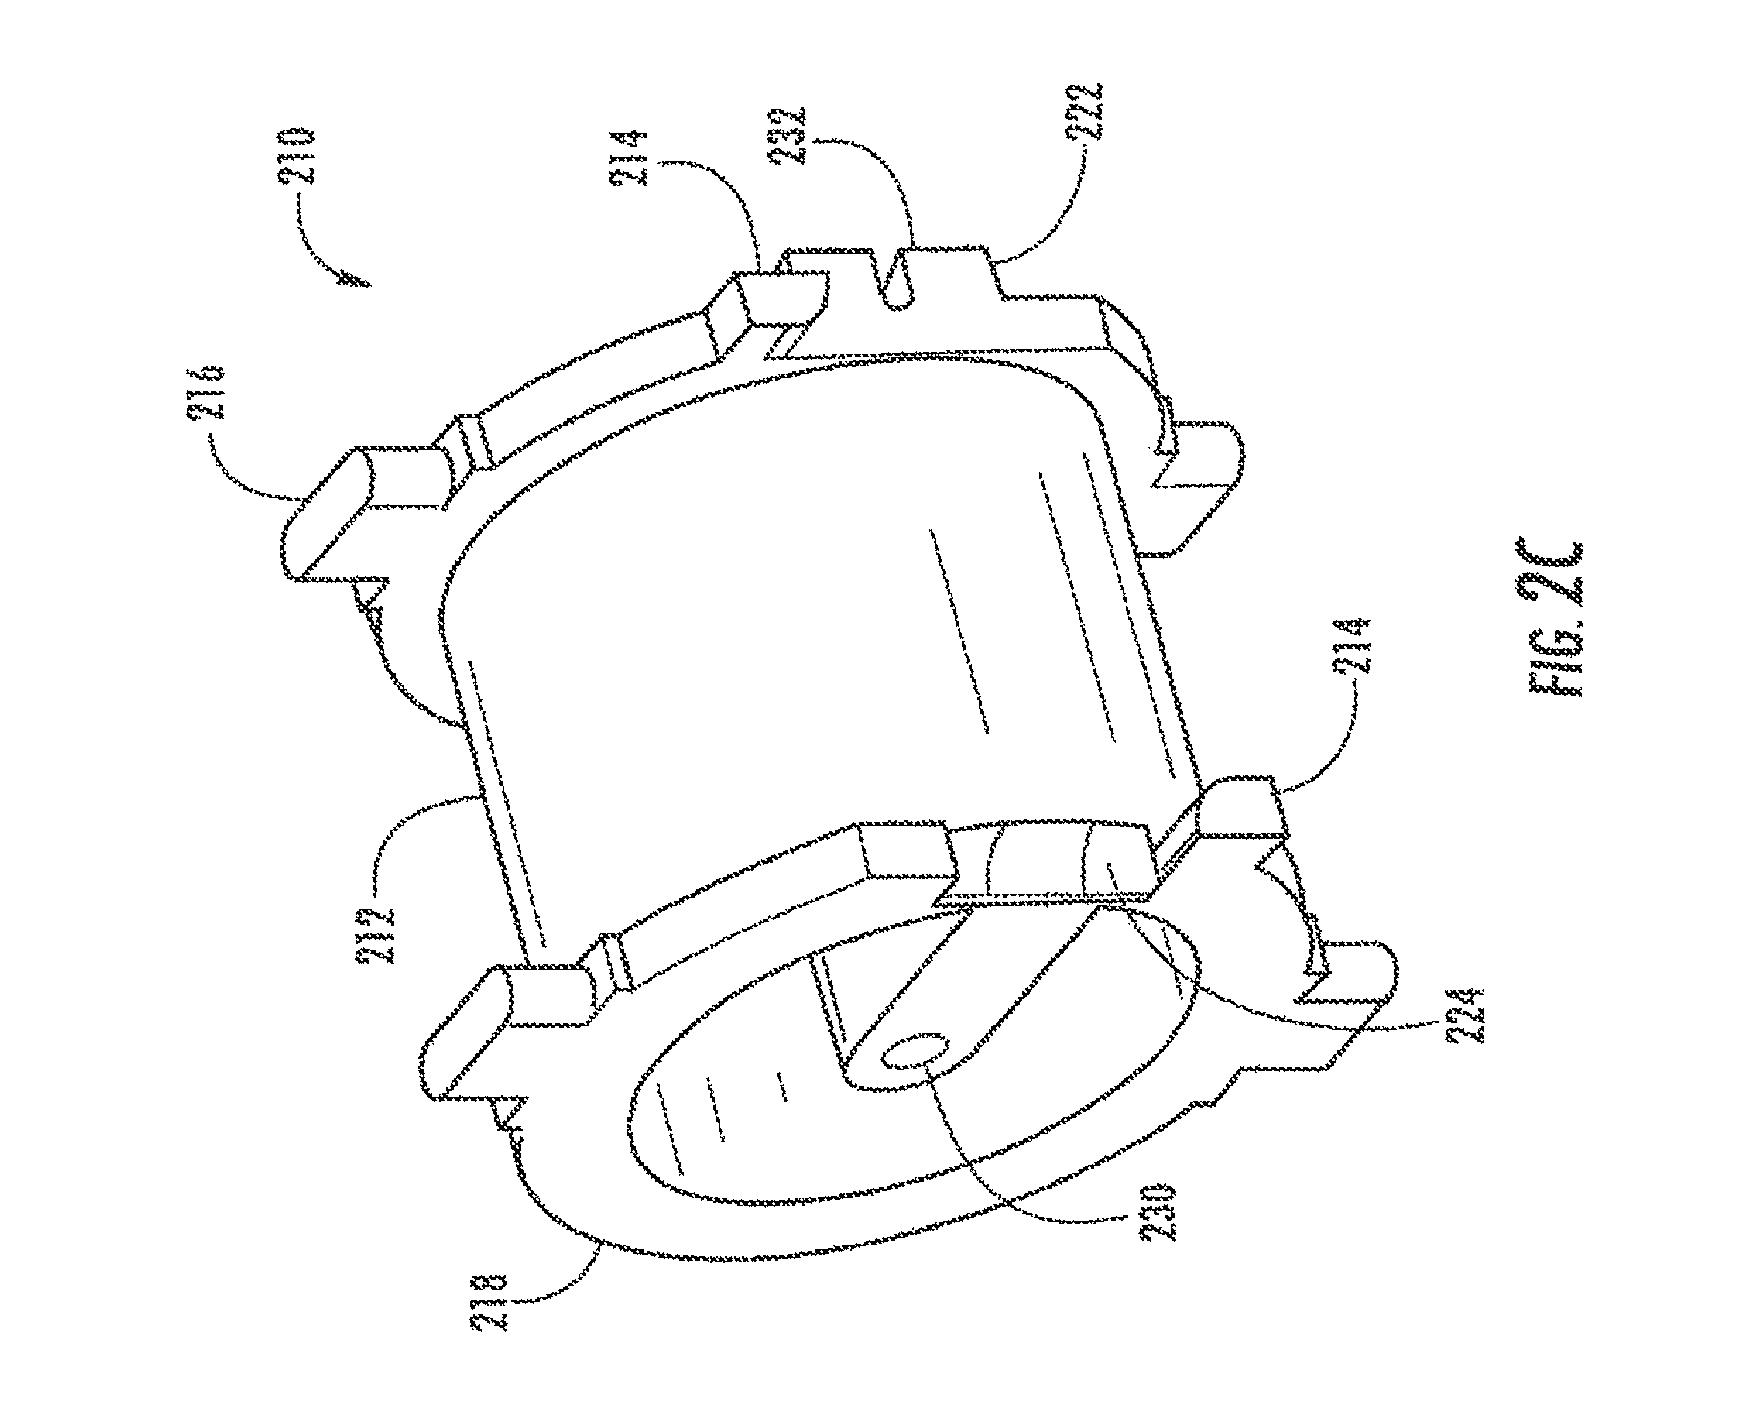 patent us 9 823 274 b2 Furnace Blower Motor Diagram patent